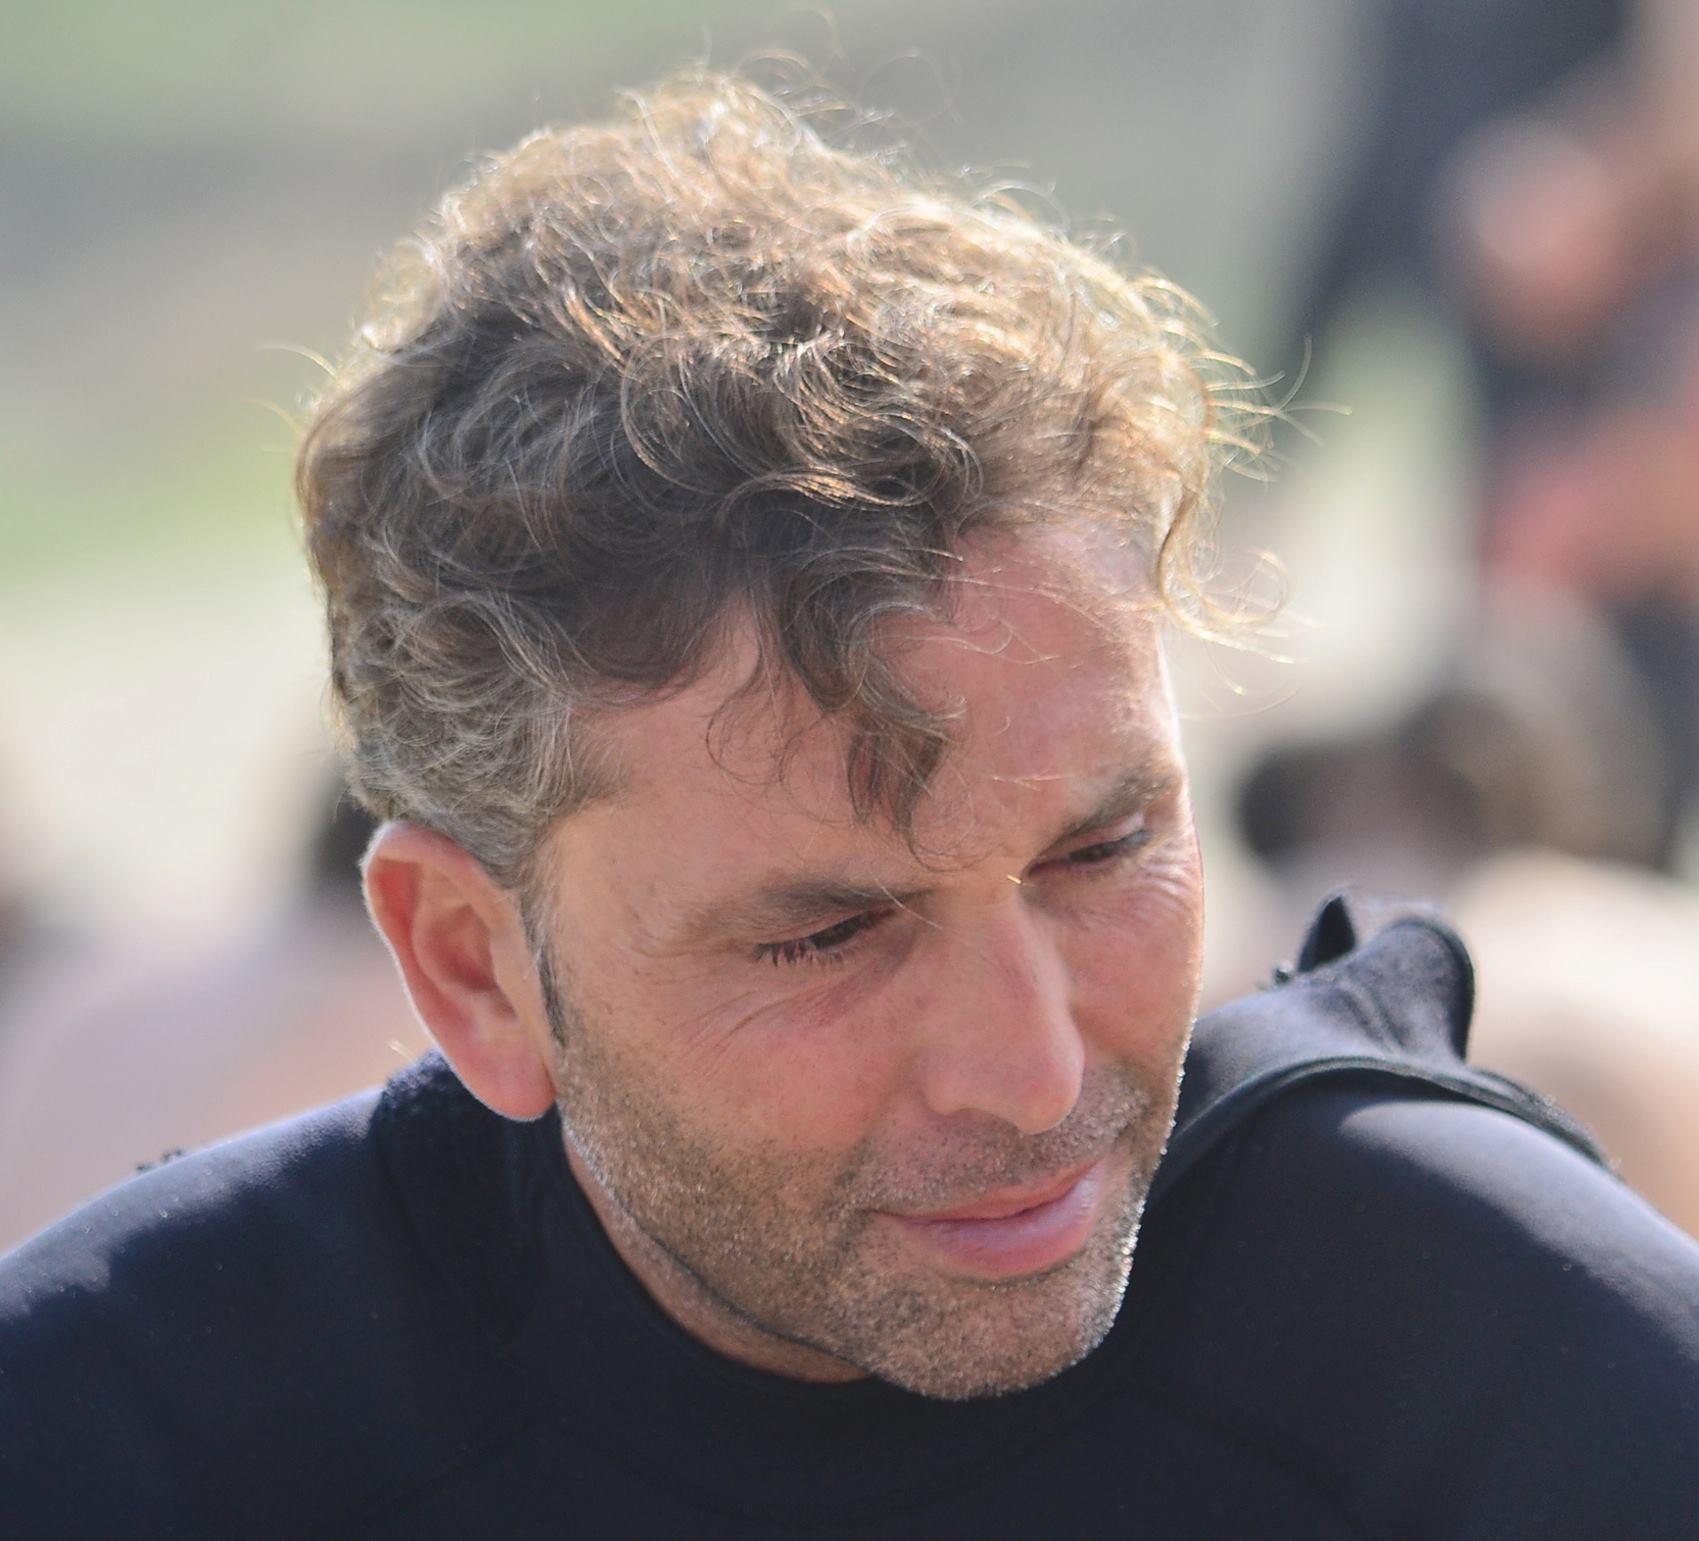 Santiago Álamo